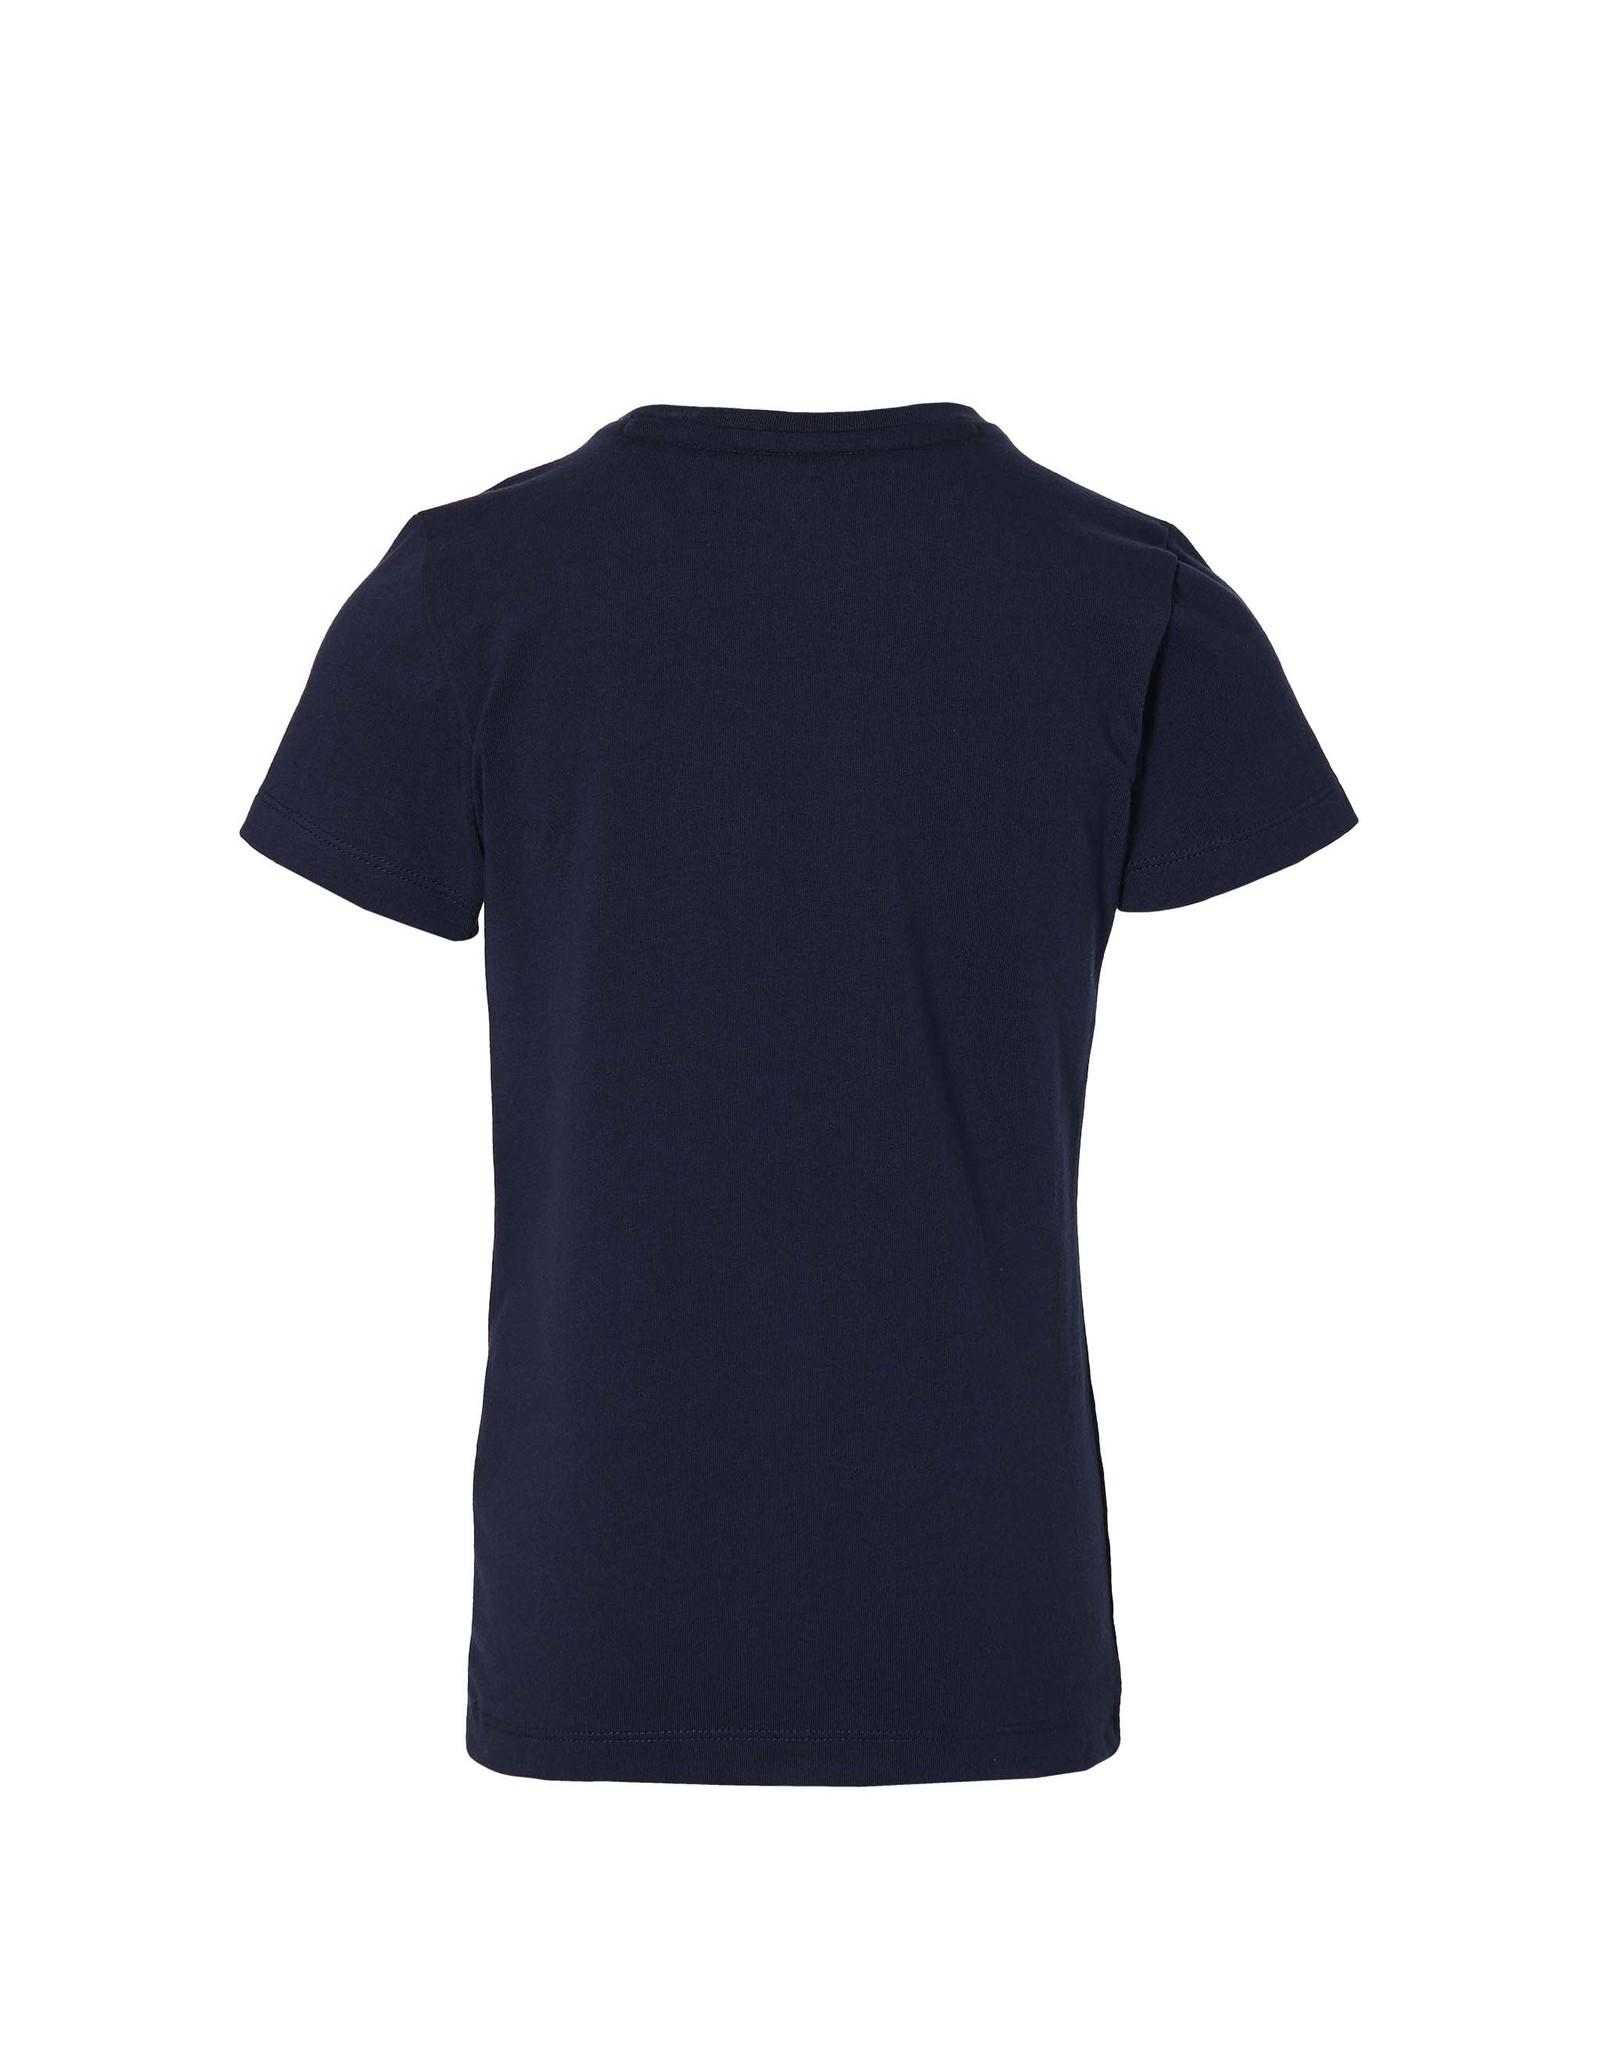 Quapi Quapi jongens t-shirt Fane Dark Blue